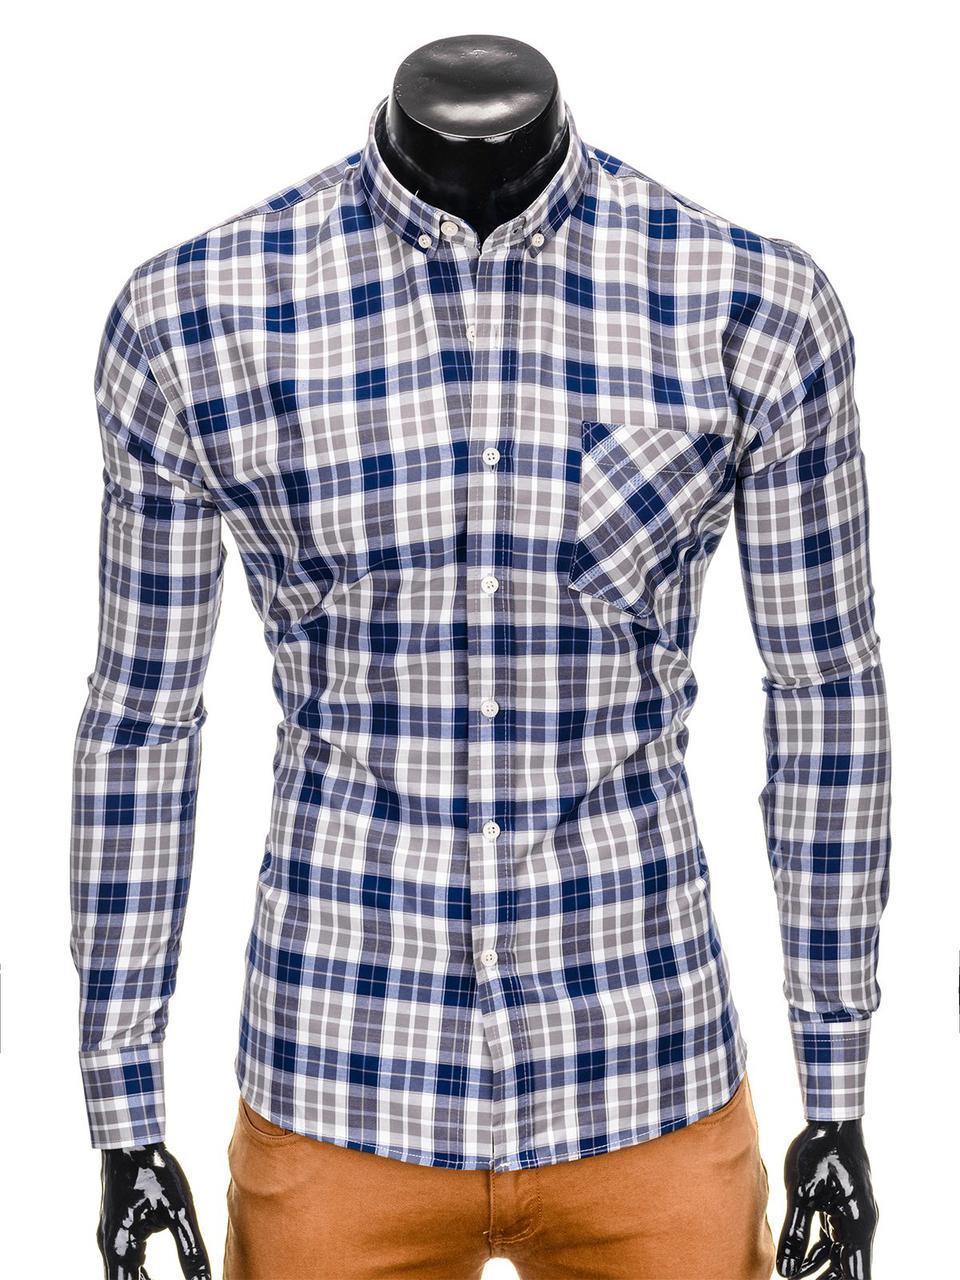 9df6f0fd7bfe Рубашка мужская R393 - голубой/Серый M, Серый, цена 505 грн., купить ...